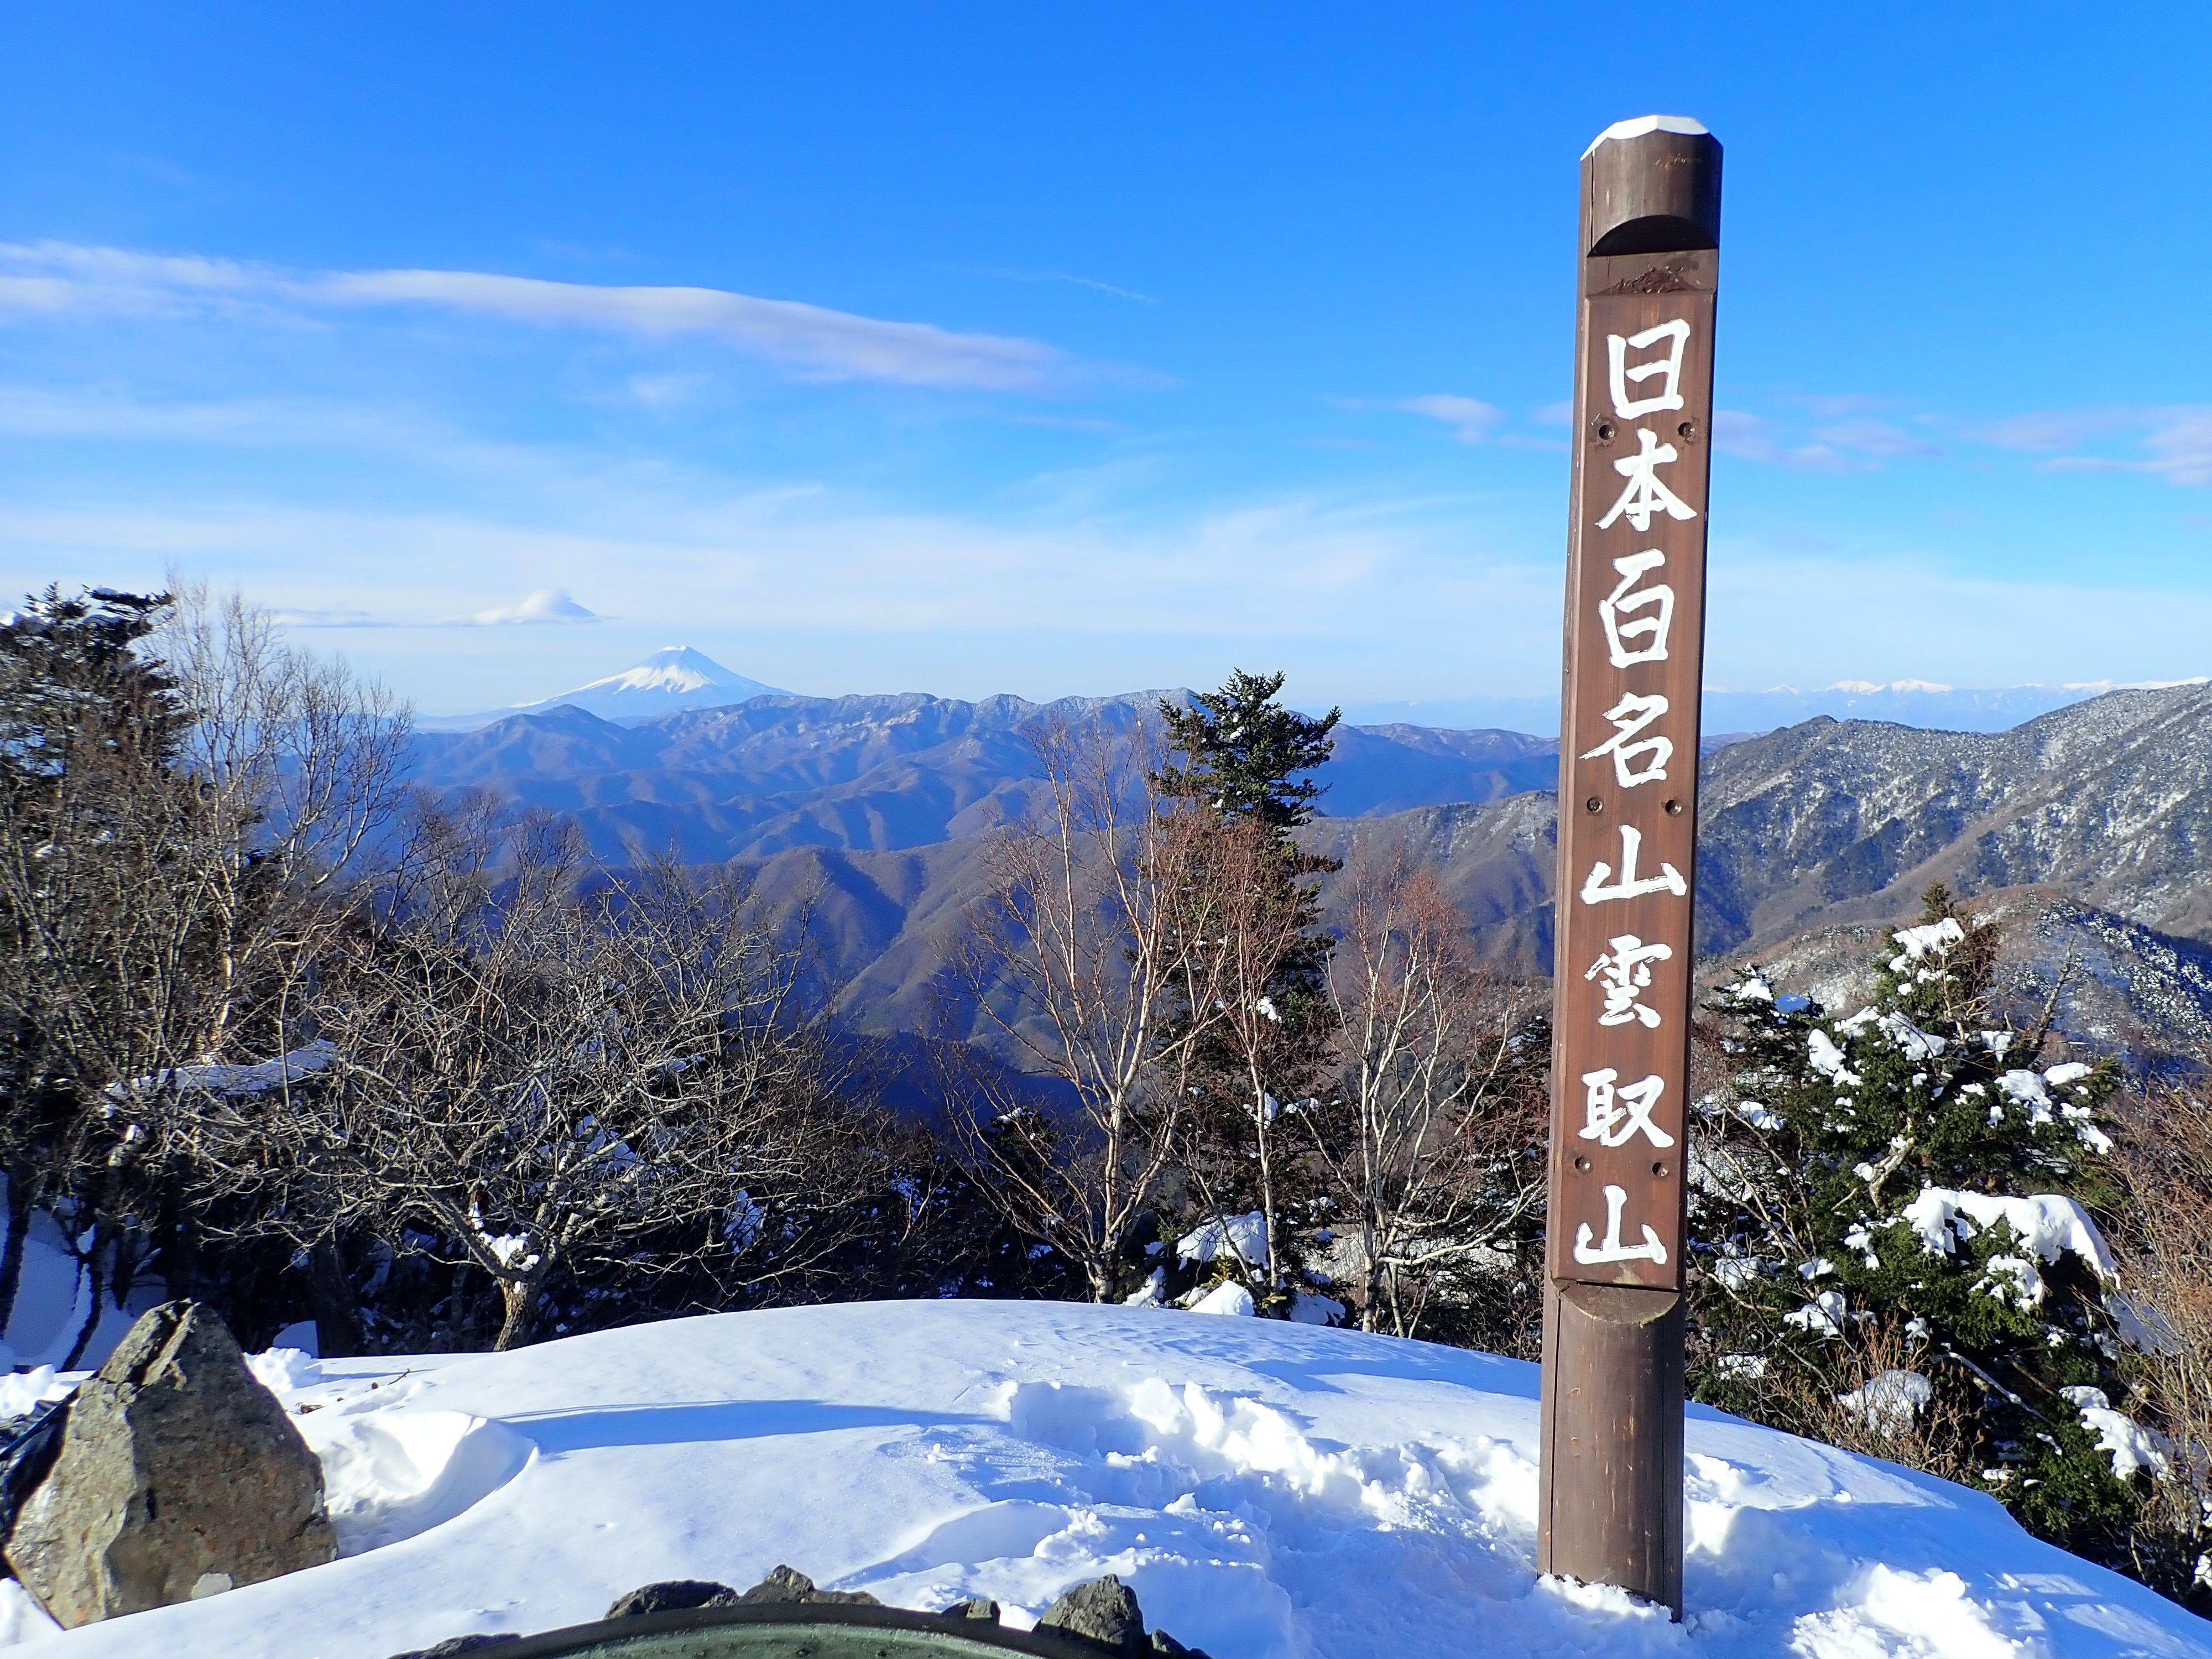 90e8889a3f 雪の雲取山ーこれが初級者登山教室修了山行だー. 2019年3月9日~10 ...